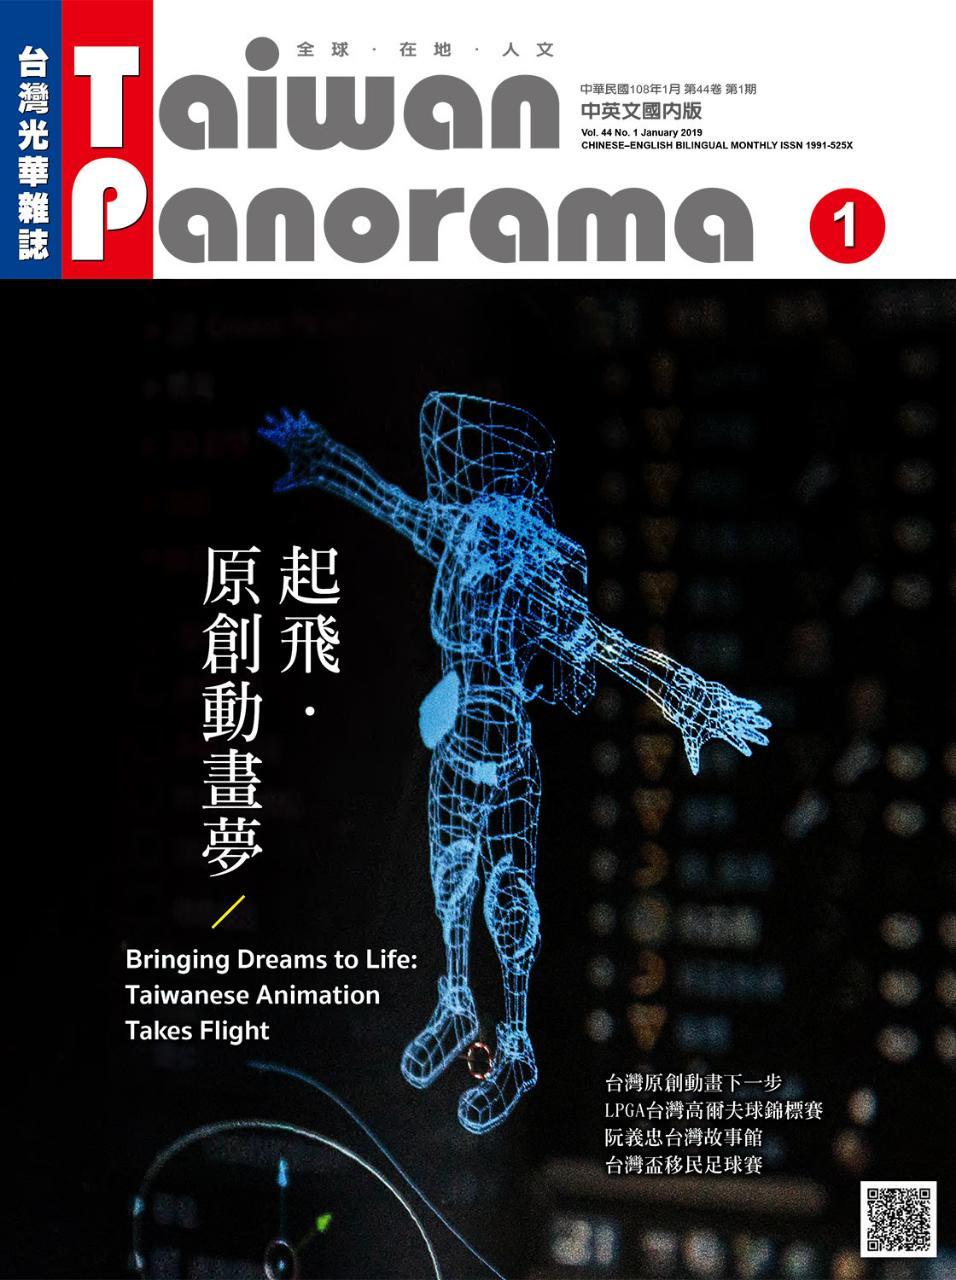 Revista Panorama Enero 2019